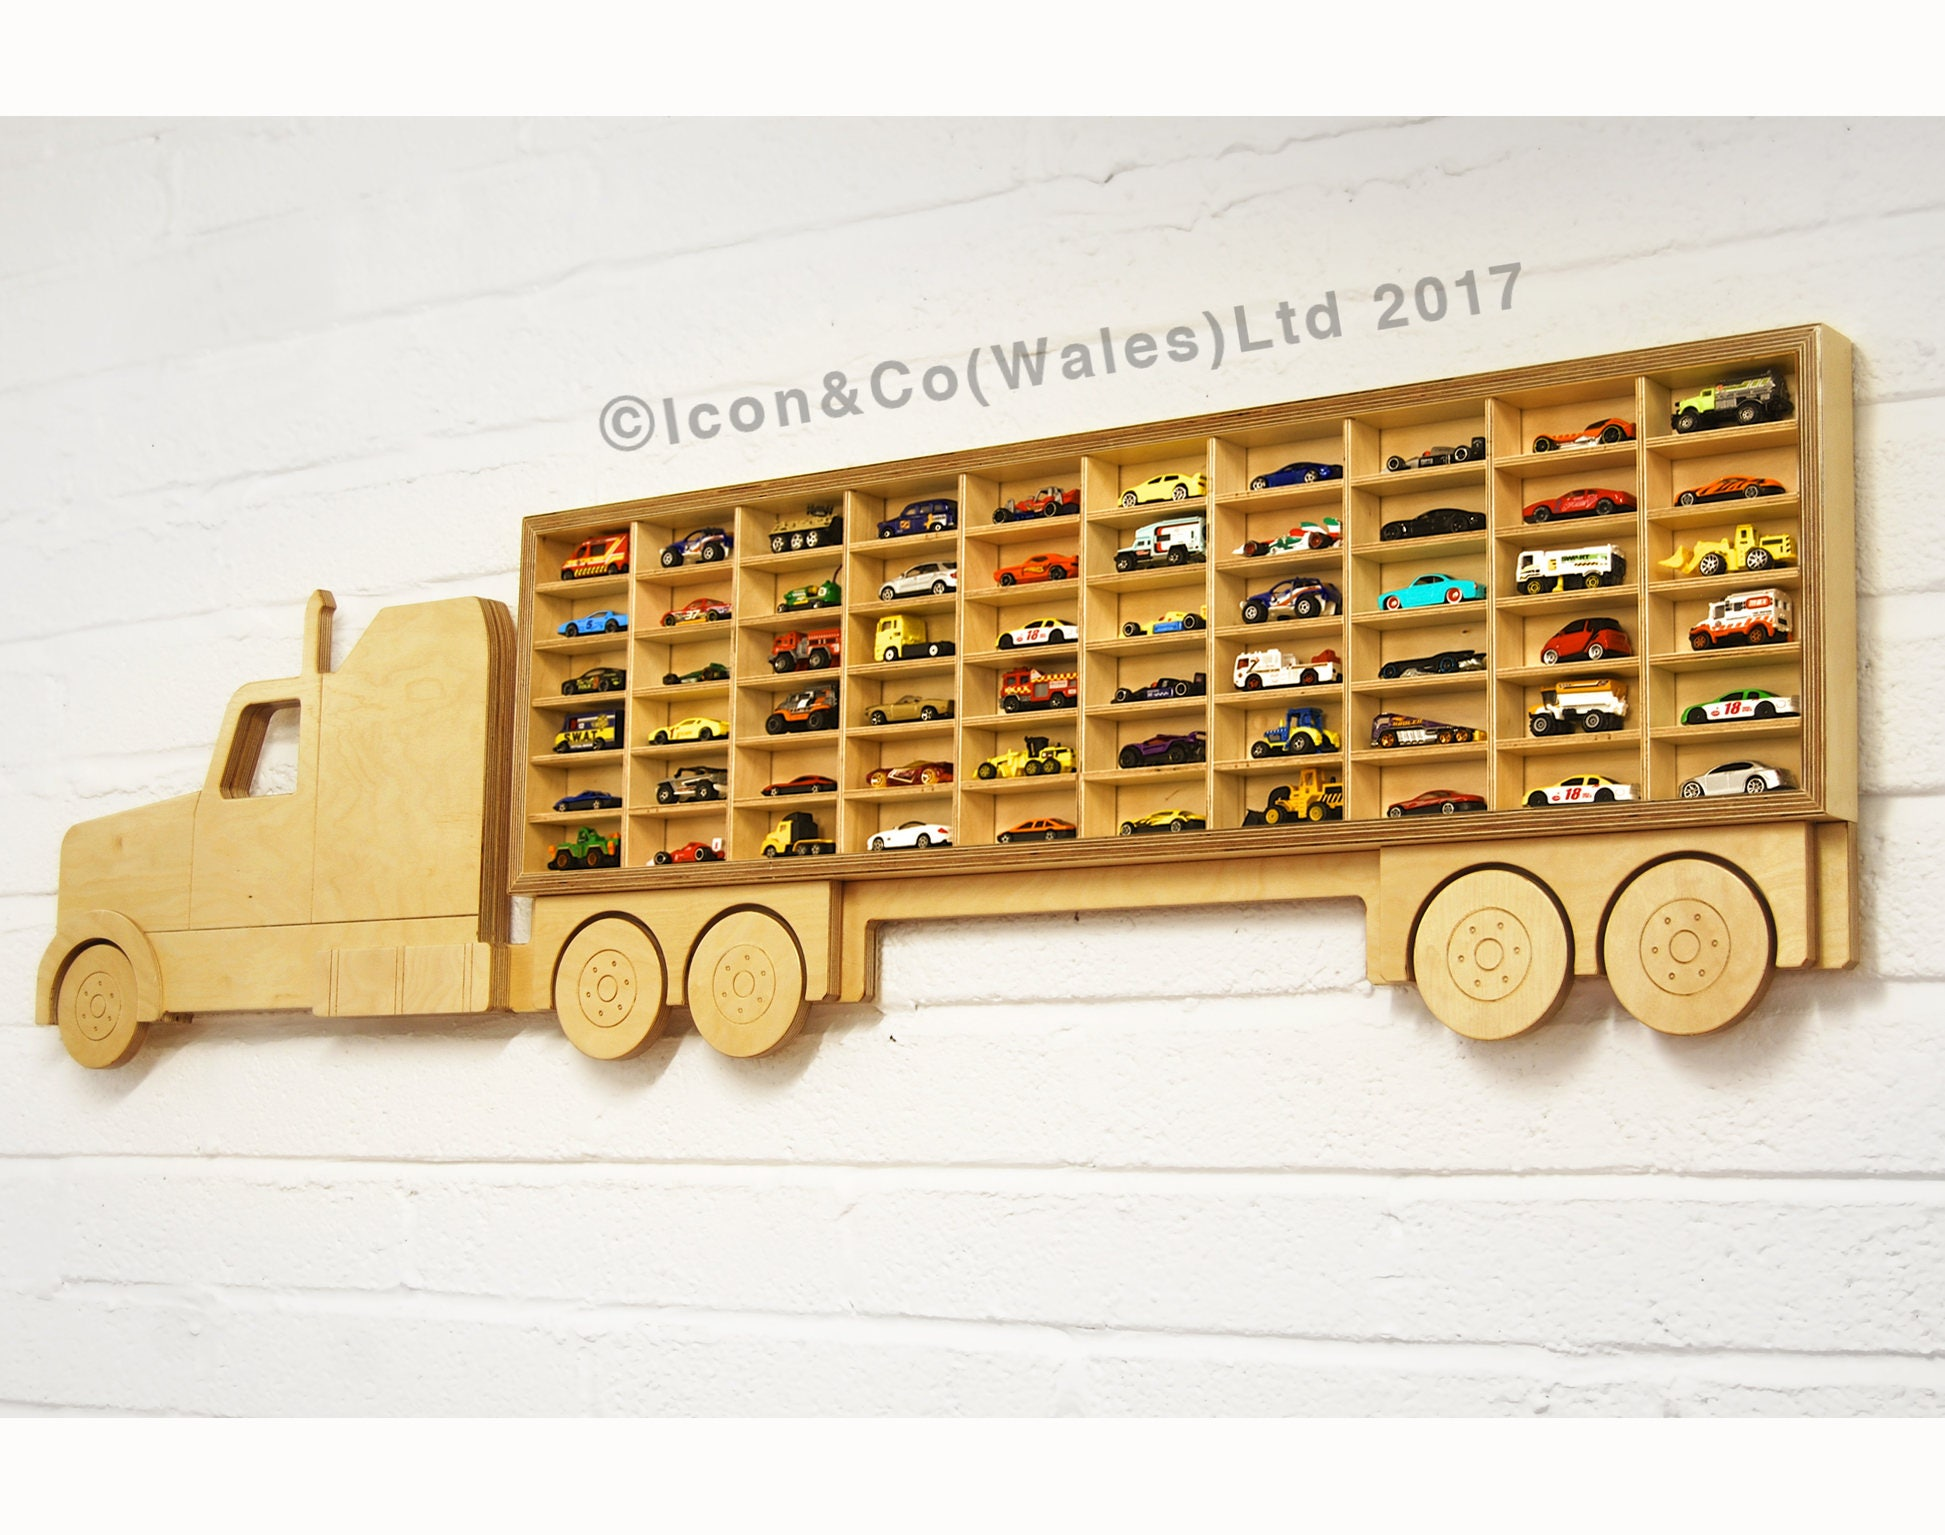 Toy Car Holder Truck : Spielzeug auto lkw regal modell